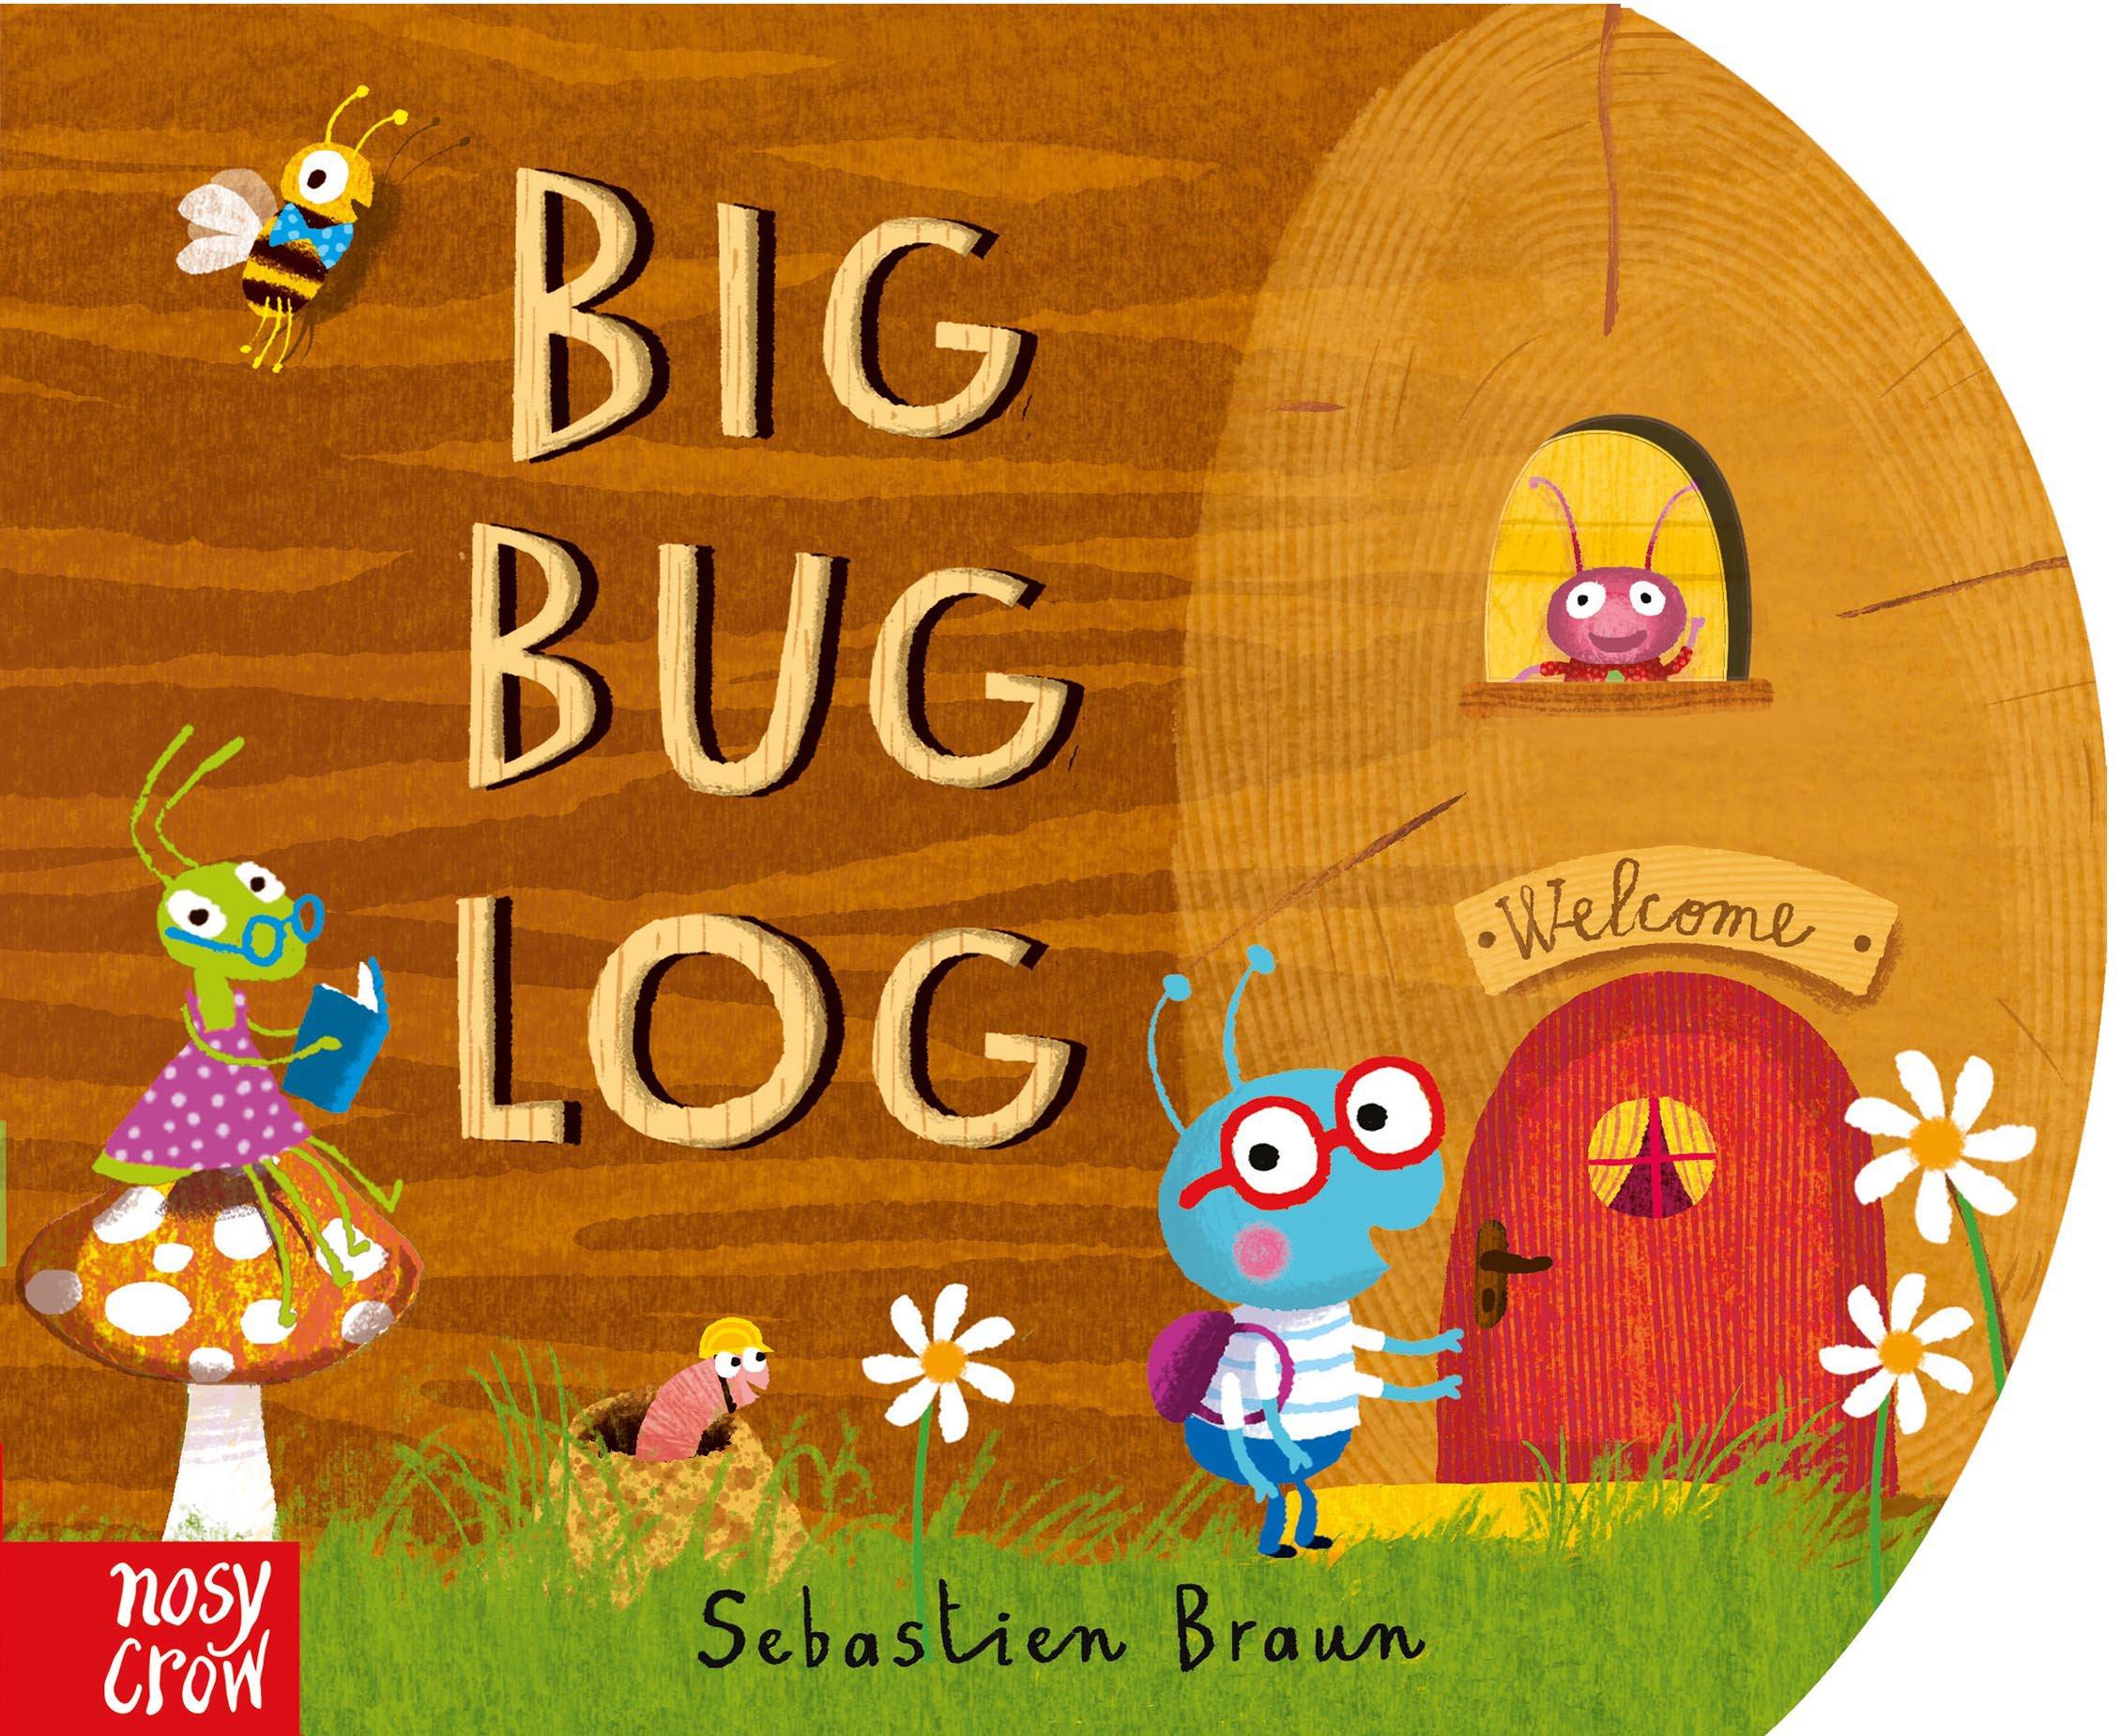 Download The Big Bug Log pdf